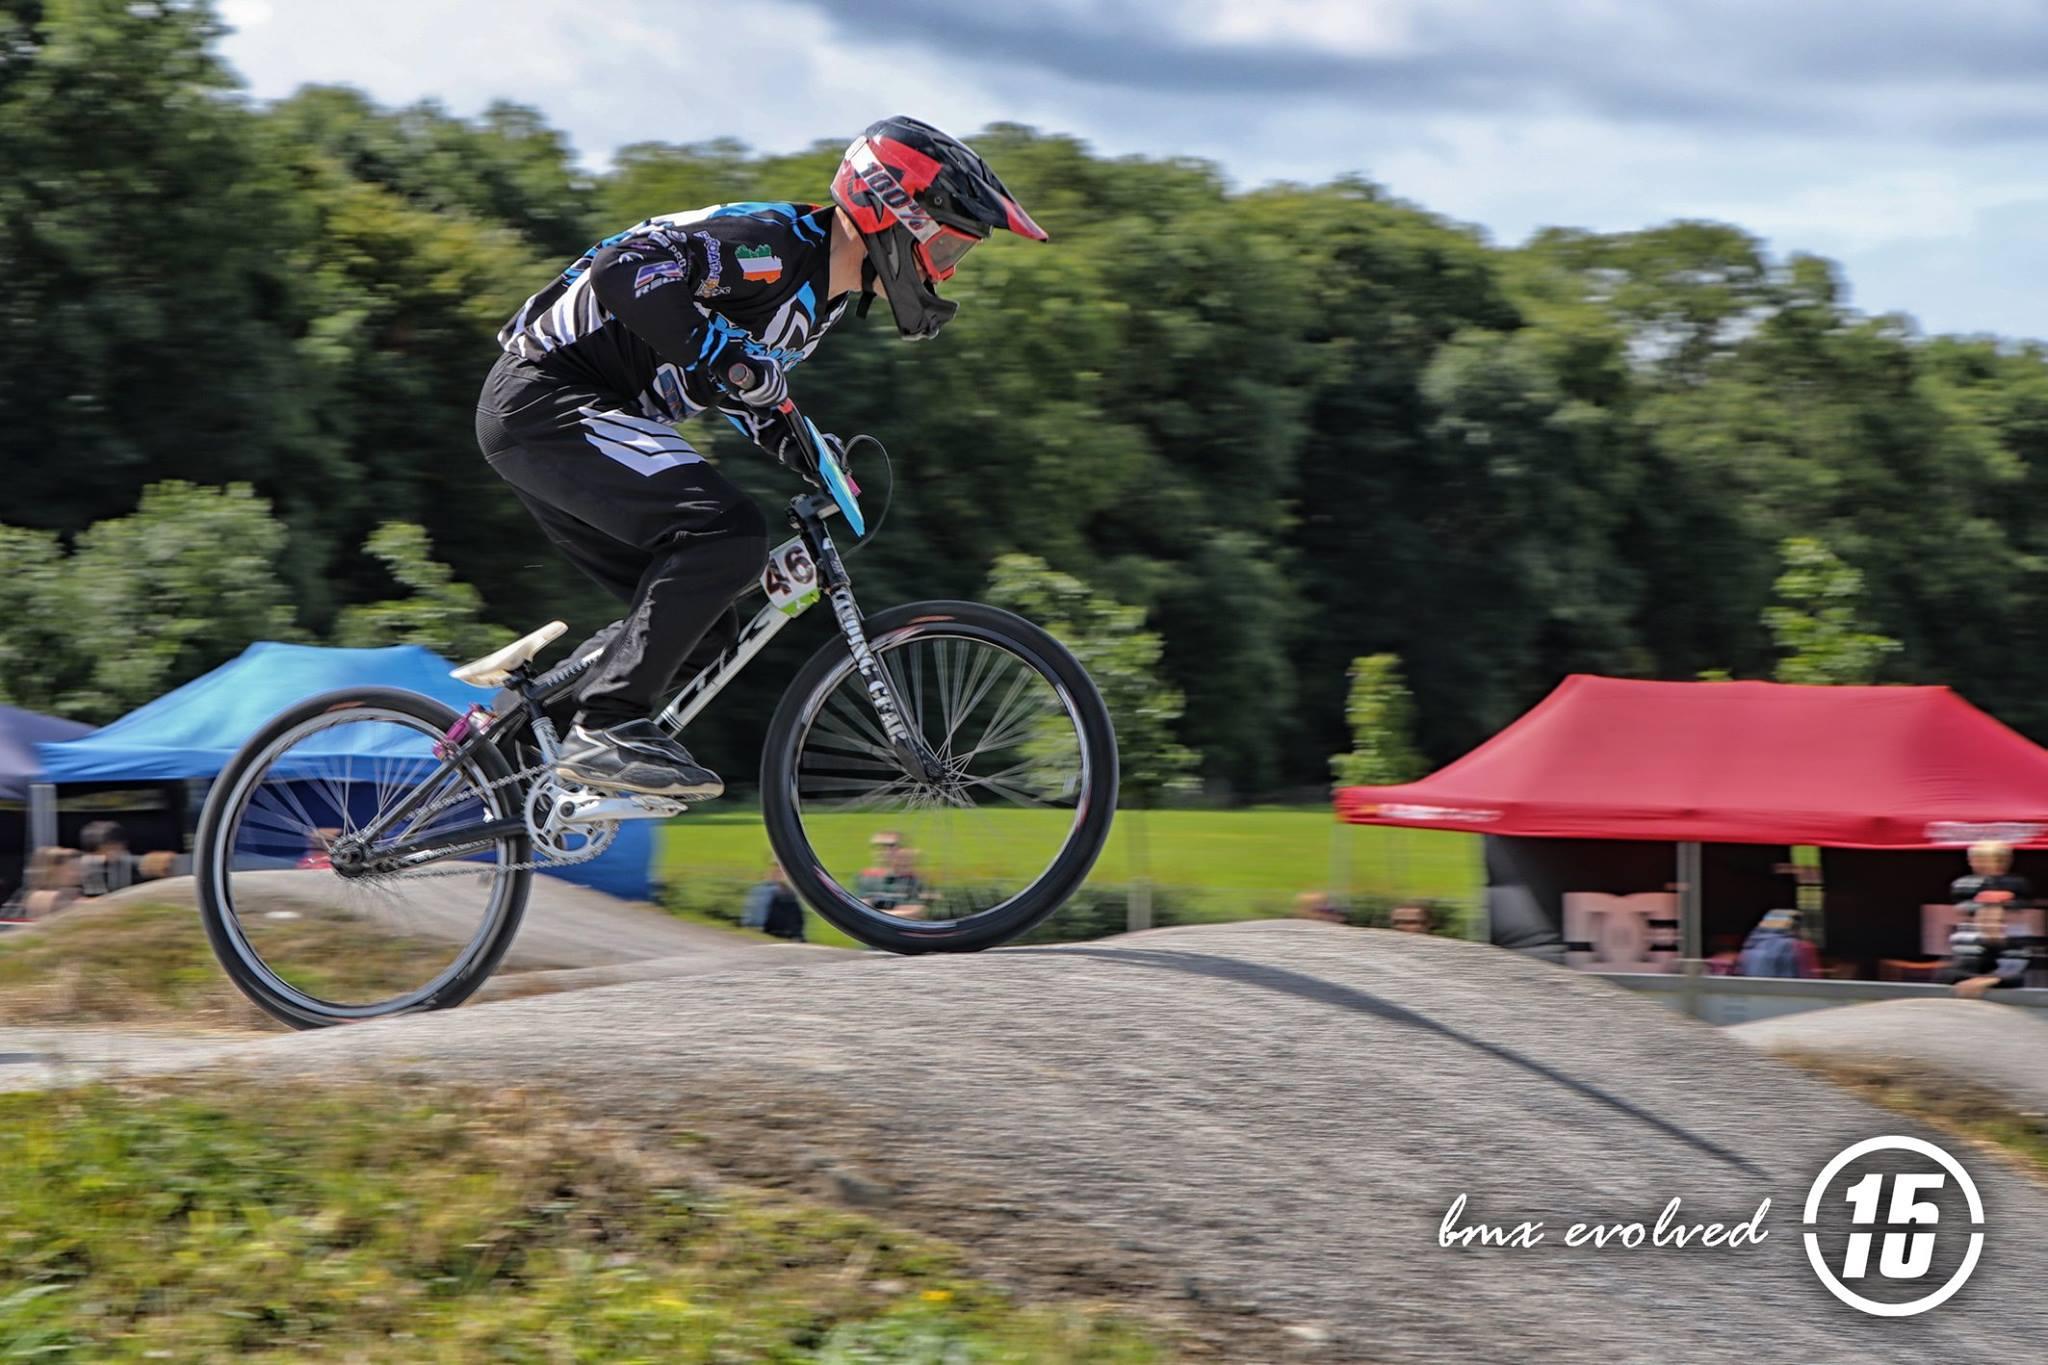 Eugene Jackson at Lucan BMX - Fifteen BMX